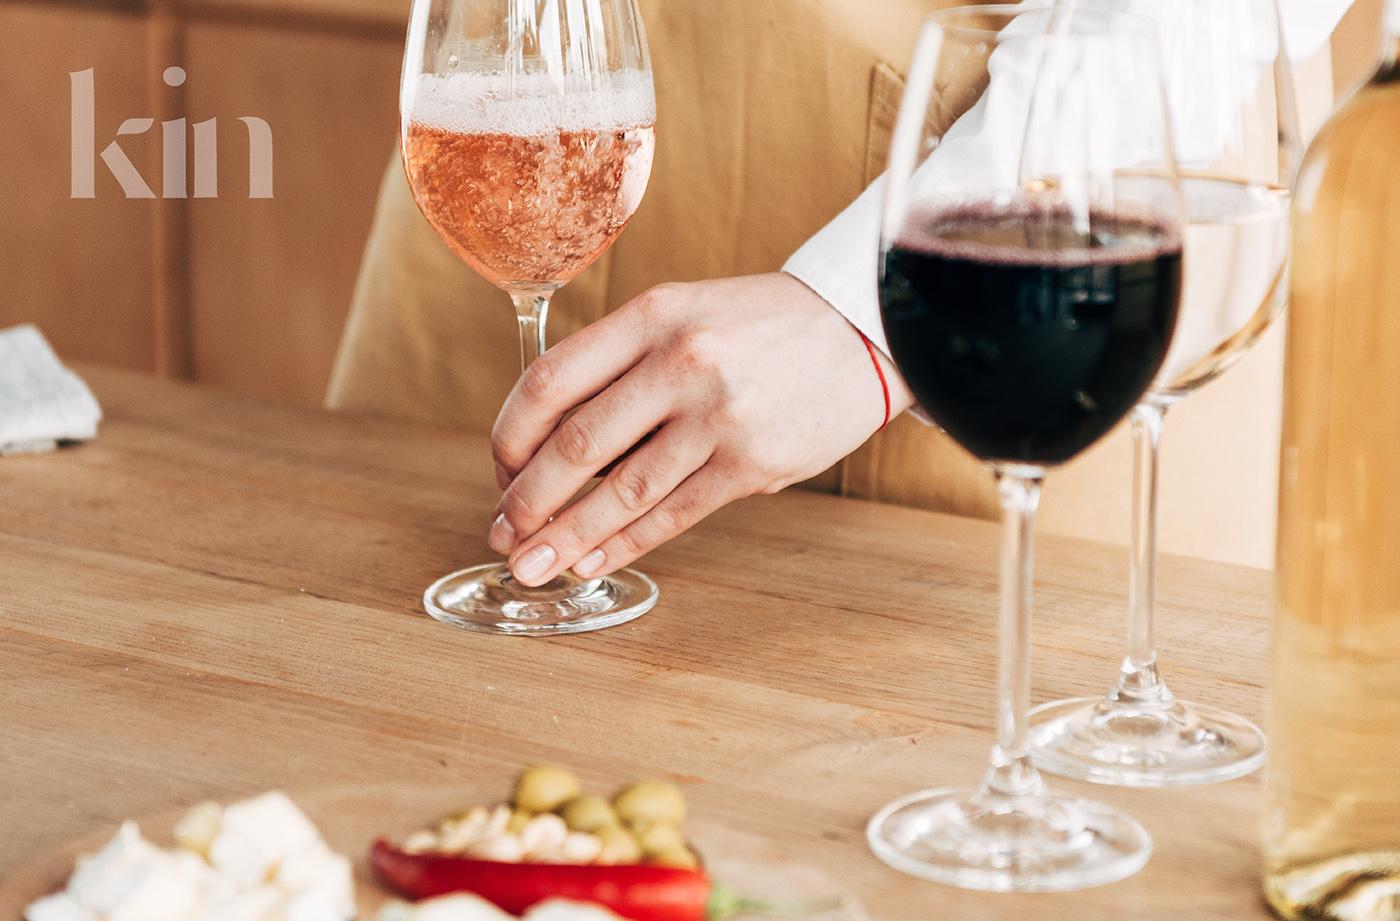 Kin - European Eatery & Bar Coming Soon